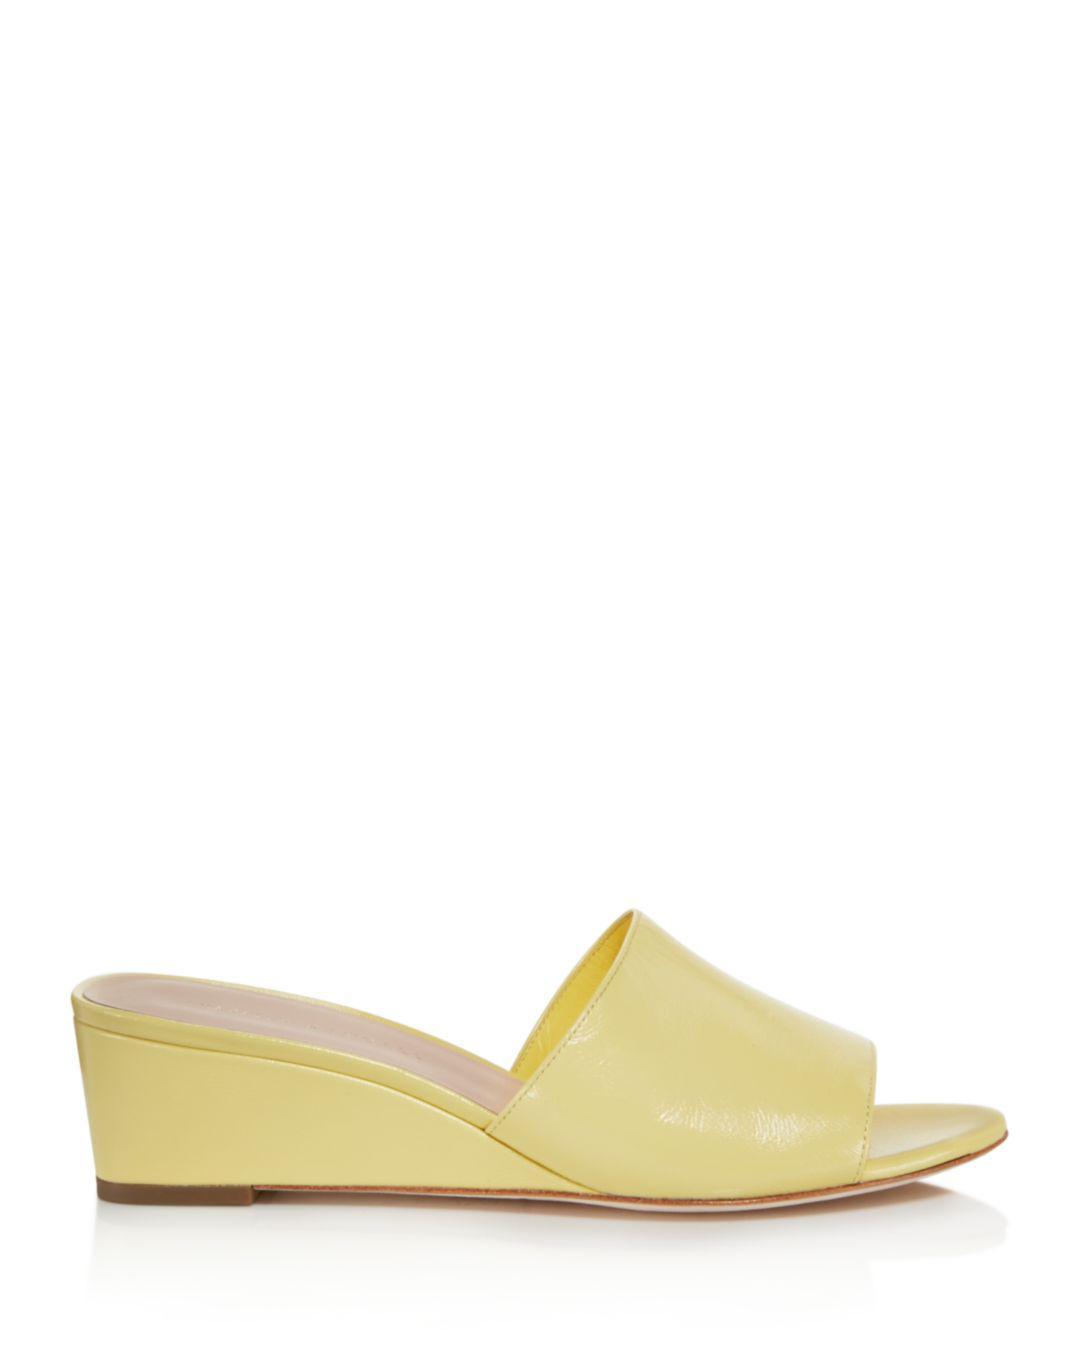 ad85aac5b7 Lyst - Loeffler Randall Women's Tilly Demi Wedge Slide Sandals - Save 40%